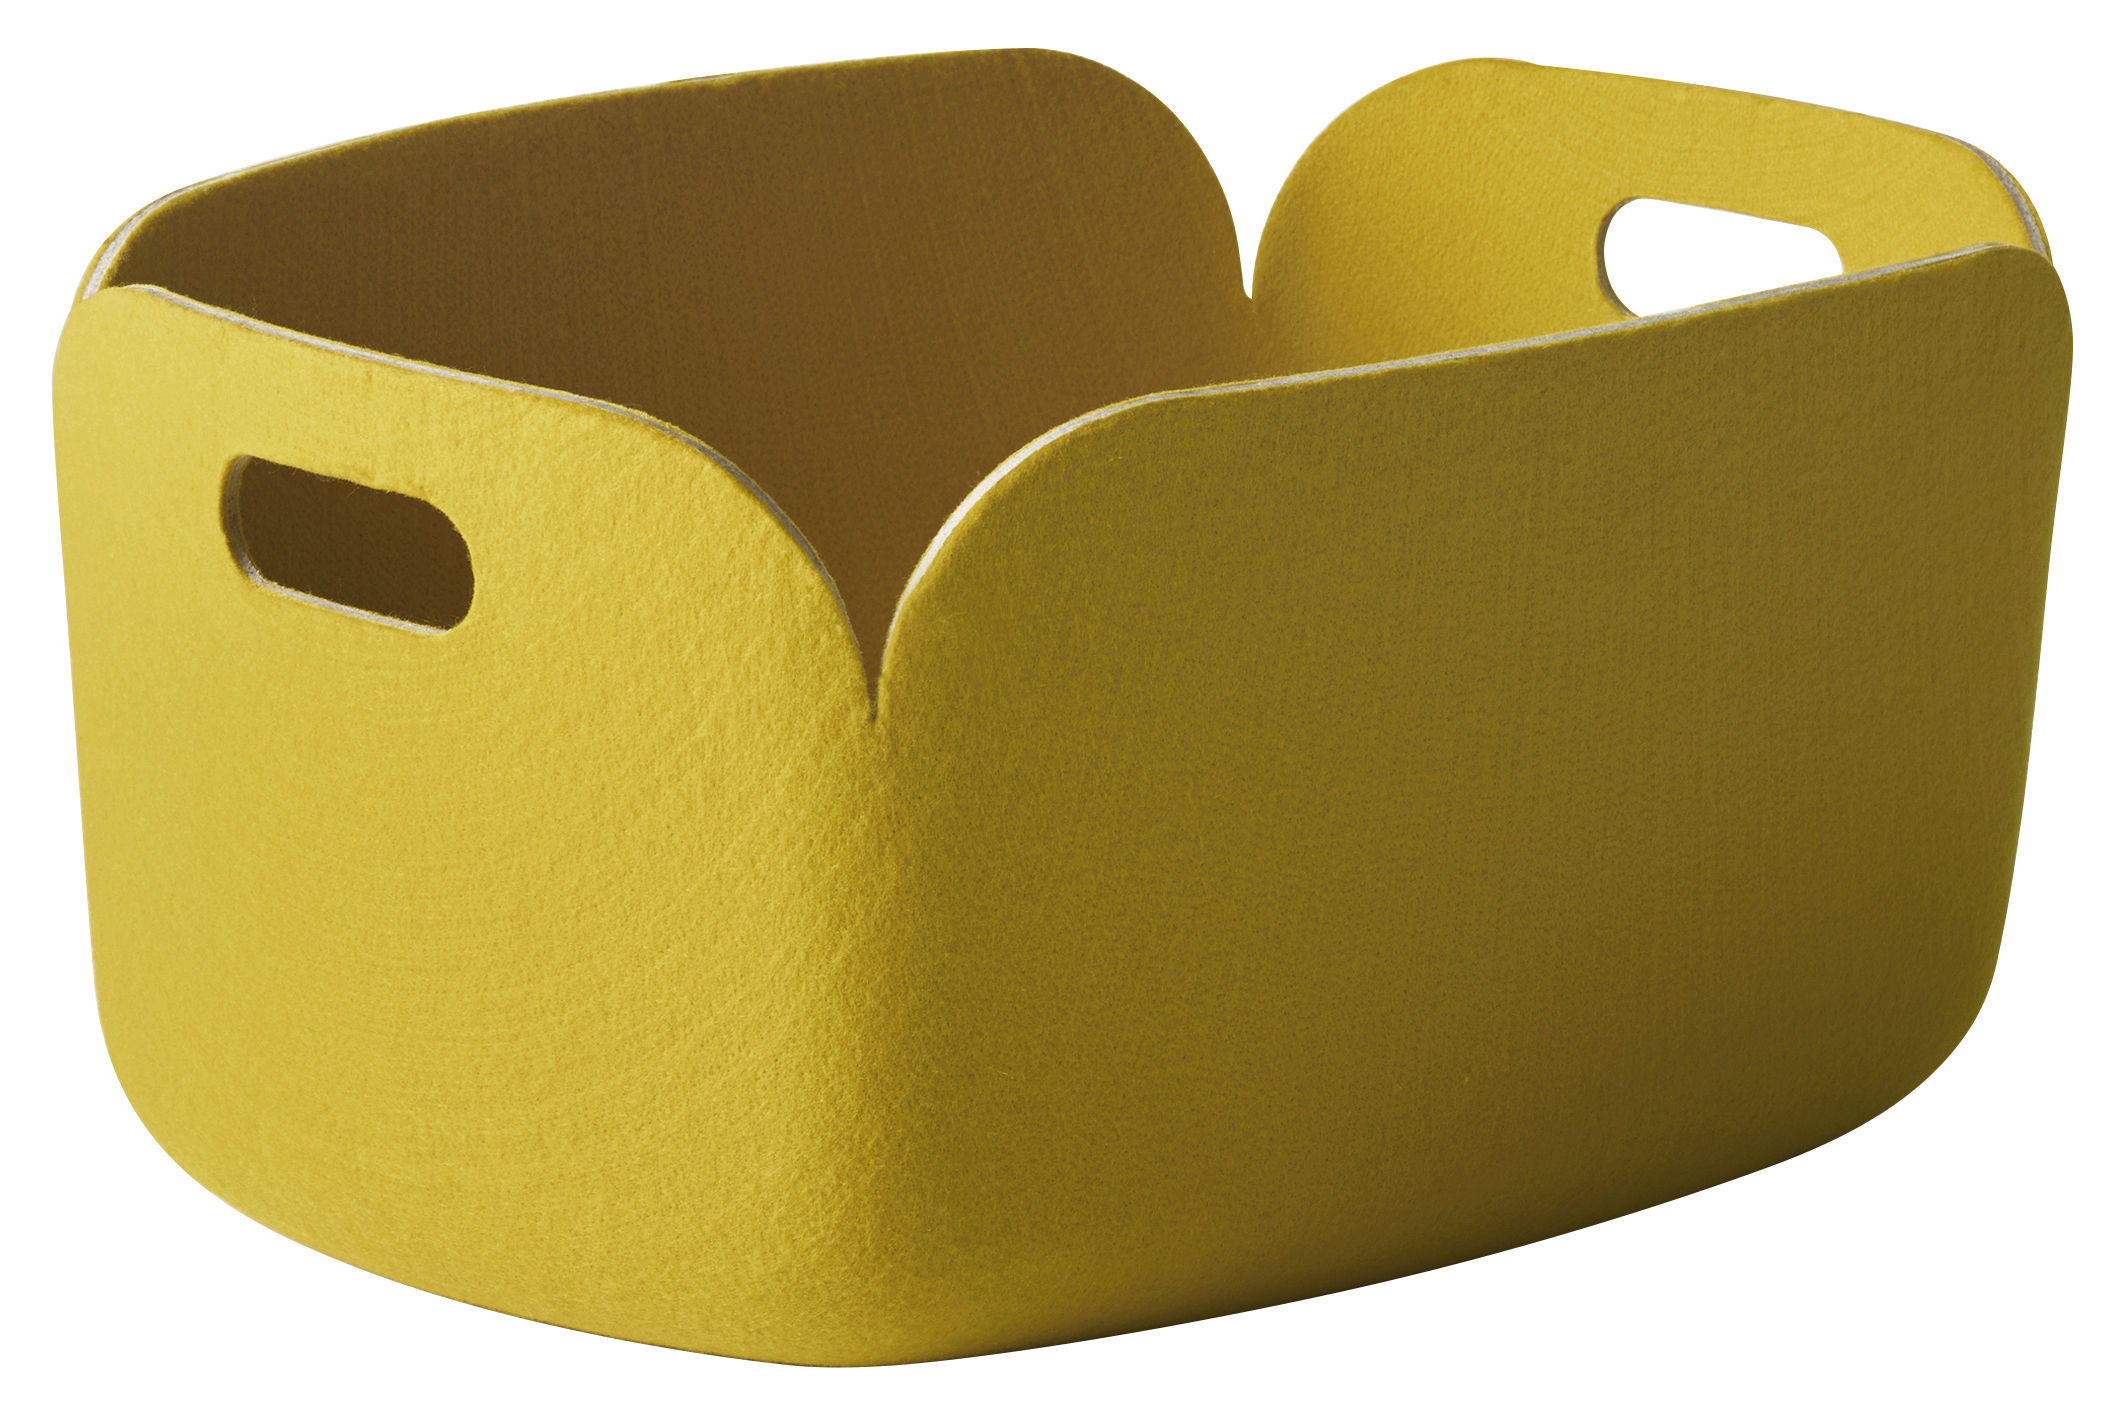 Dekoration - Körbe und Ablagen - Restore Korb 100% recyceltes Material - Muuto - Gelb - Filz